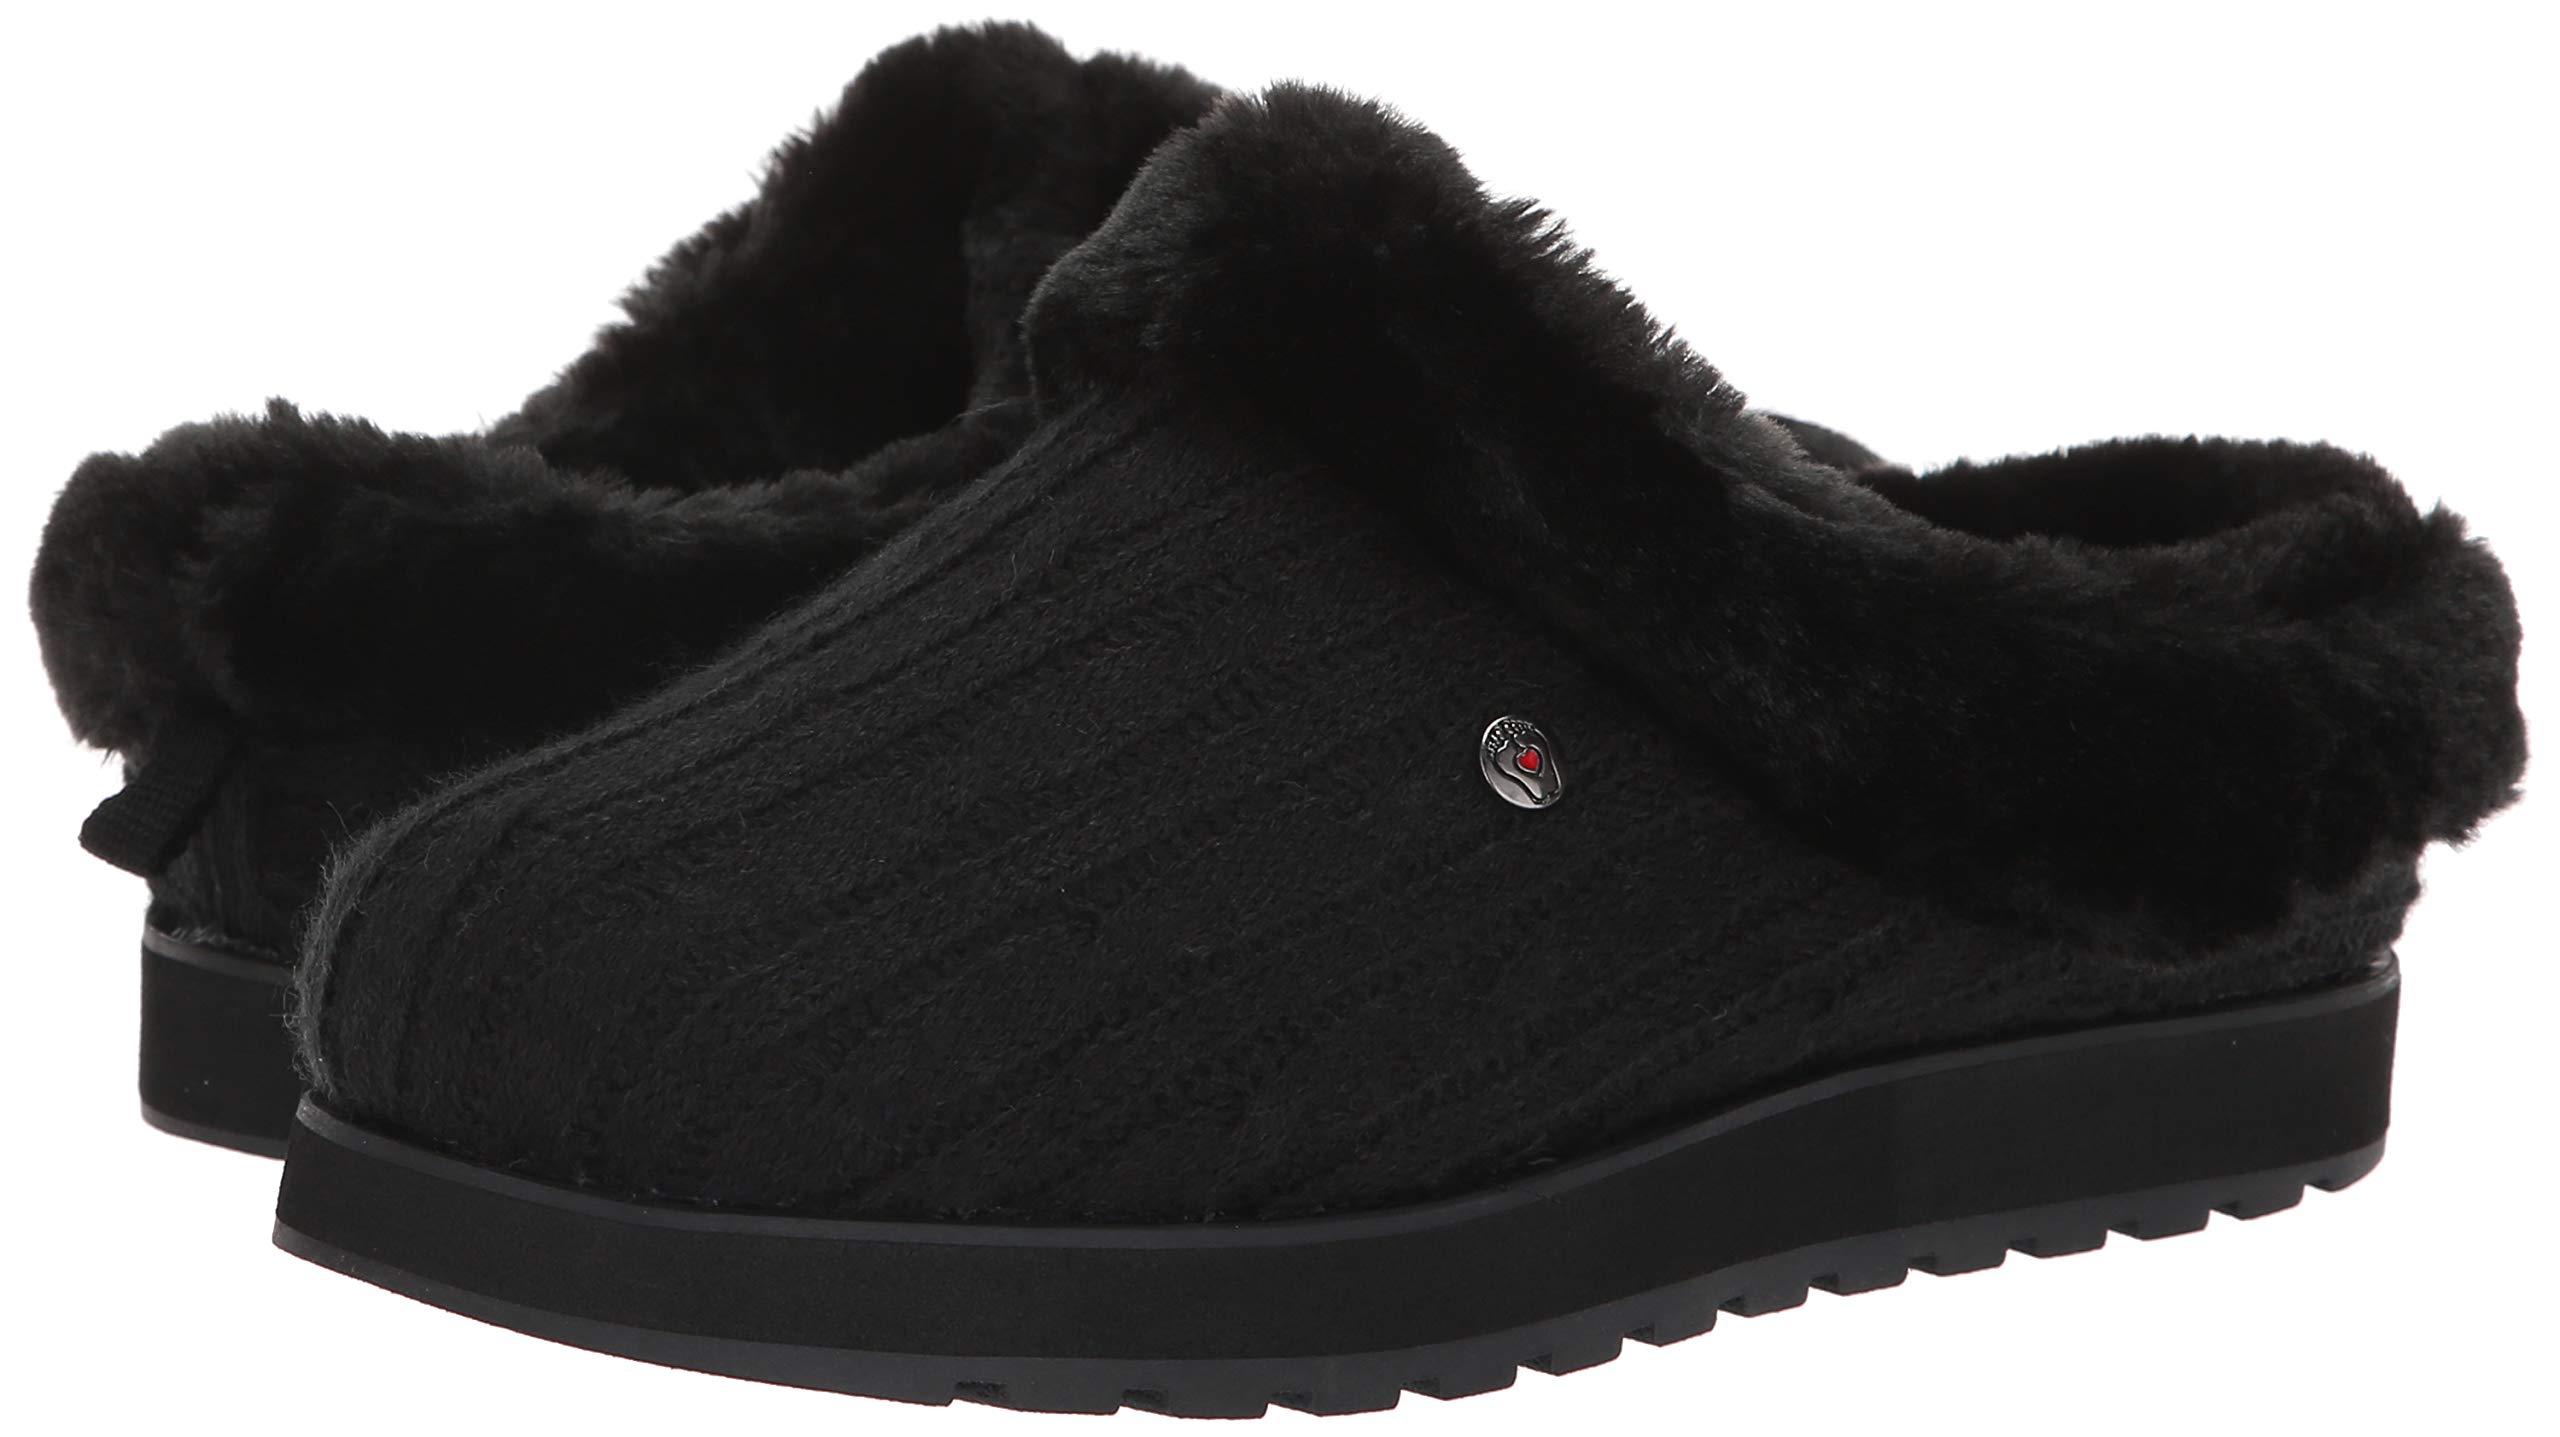 3f1e5ade8b59 BOBS from Skechers Women s Keepsakes Ice Angel Slipper - -   Mules   Clogs    Clothing